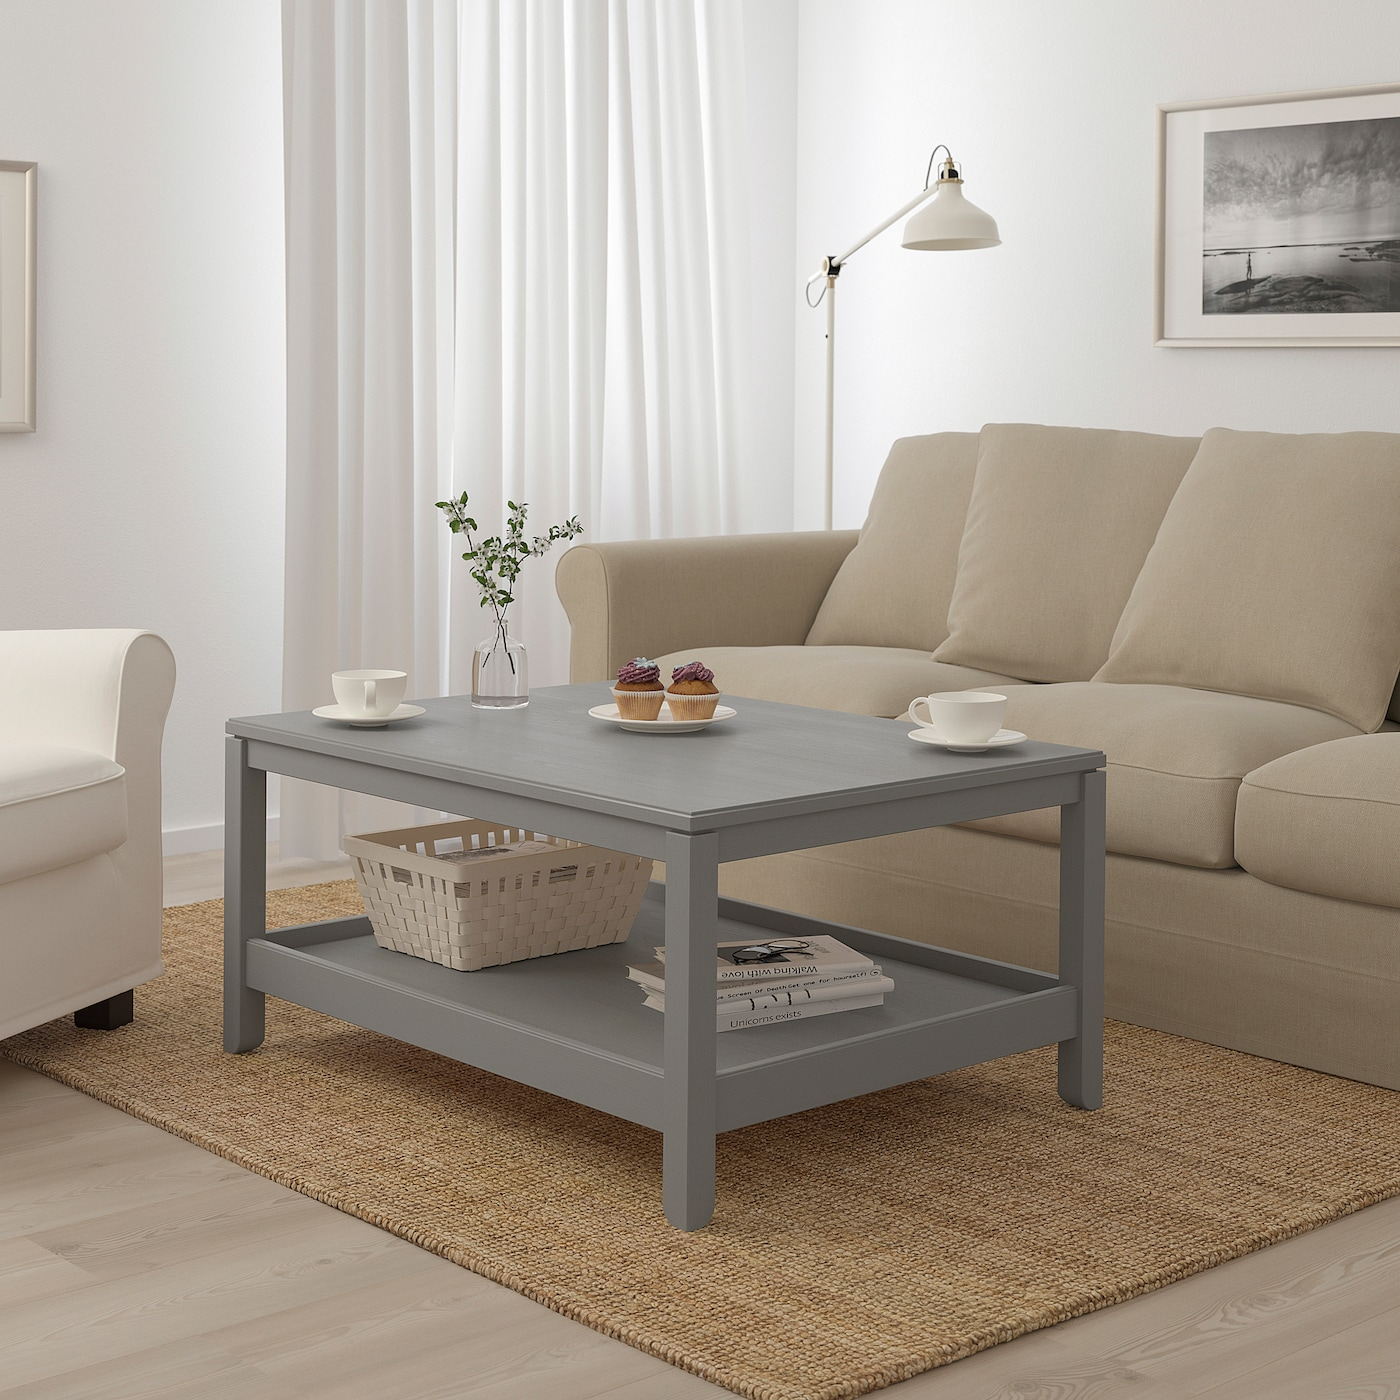 Havsta Coffee Table Gray 39 3 8x29 1 2 Ikea